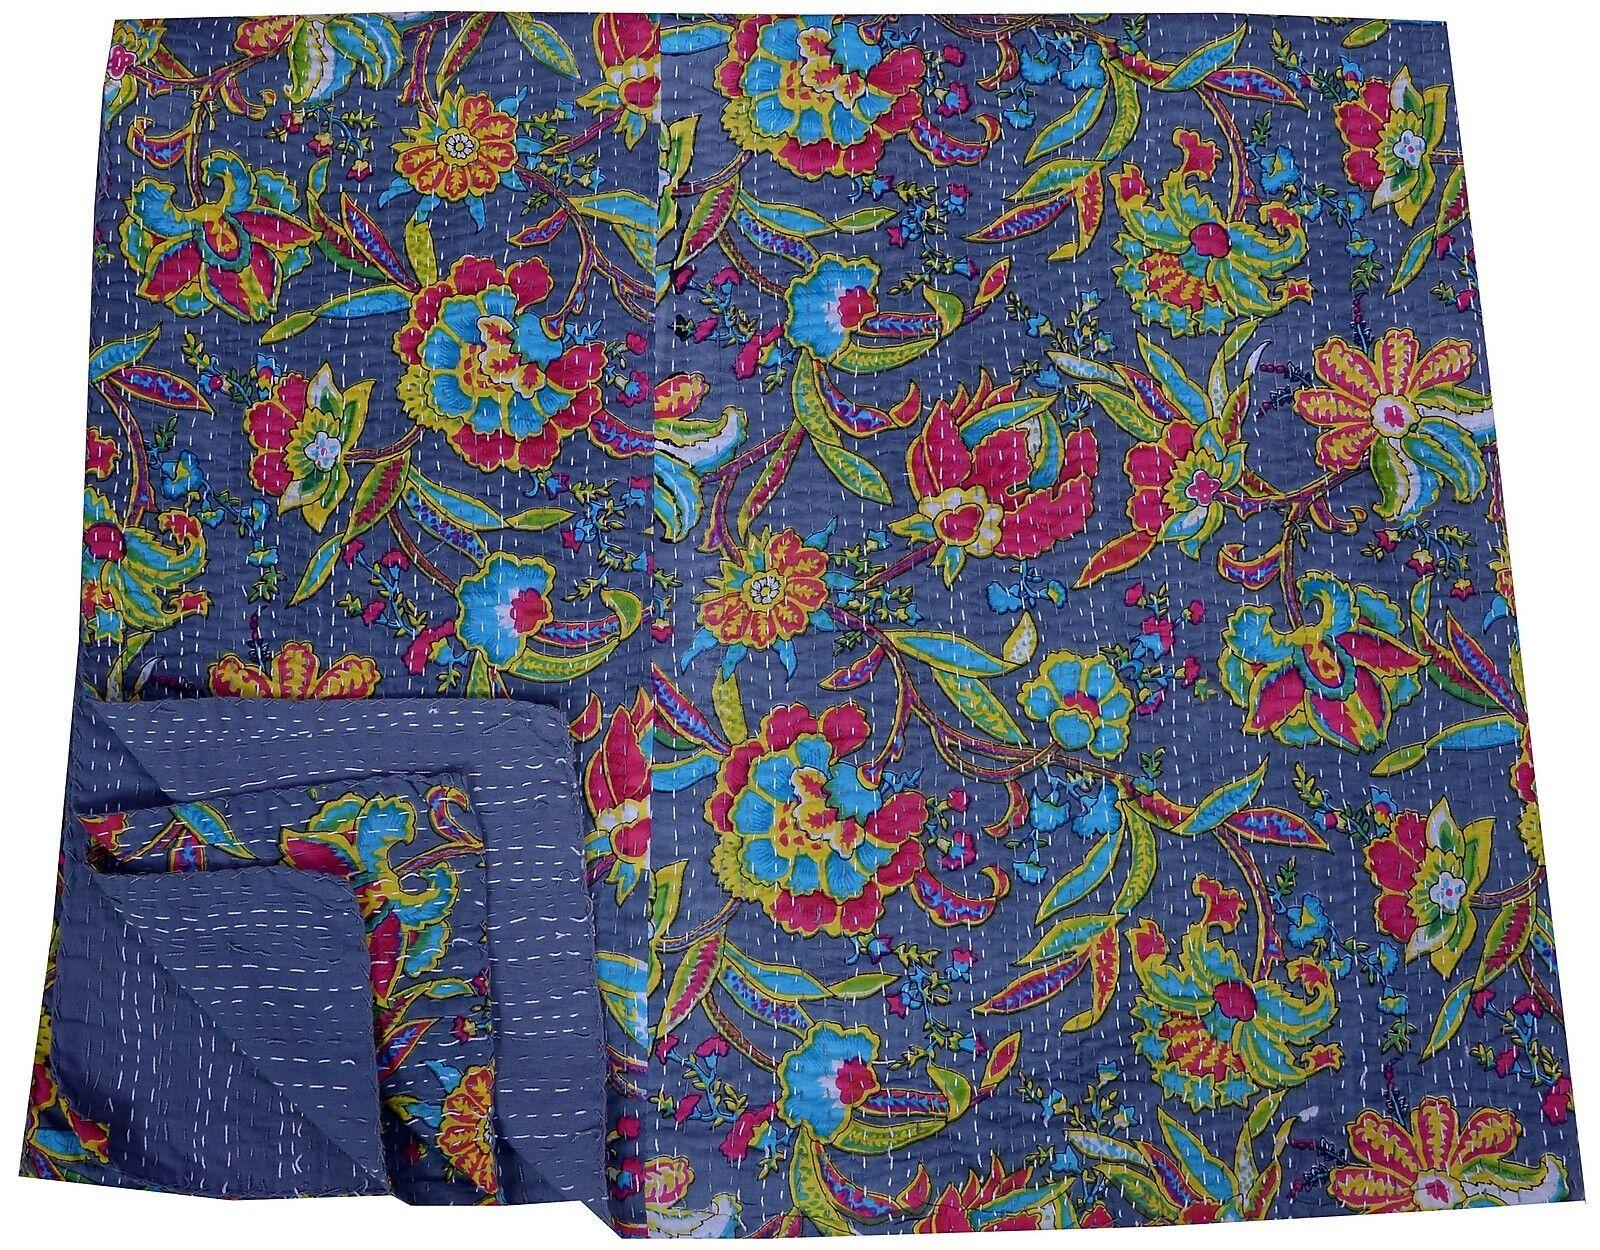 grau Floral kantha Quilt Indian Cotton Bedspread Handmade Reversible Blanket Art